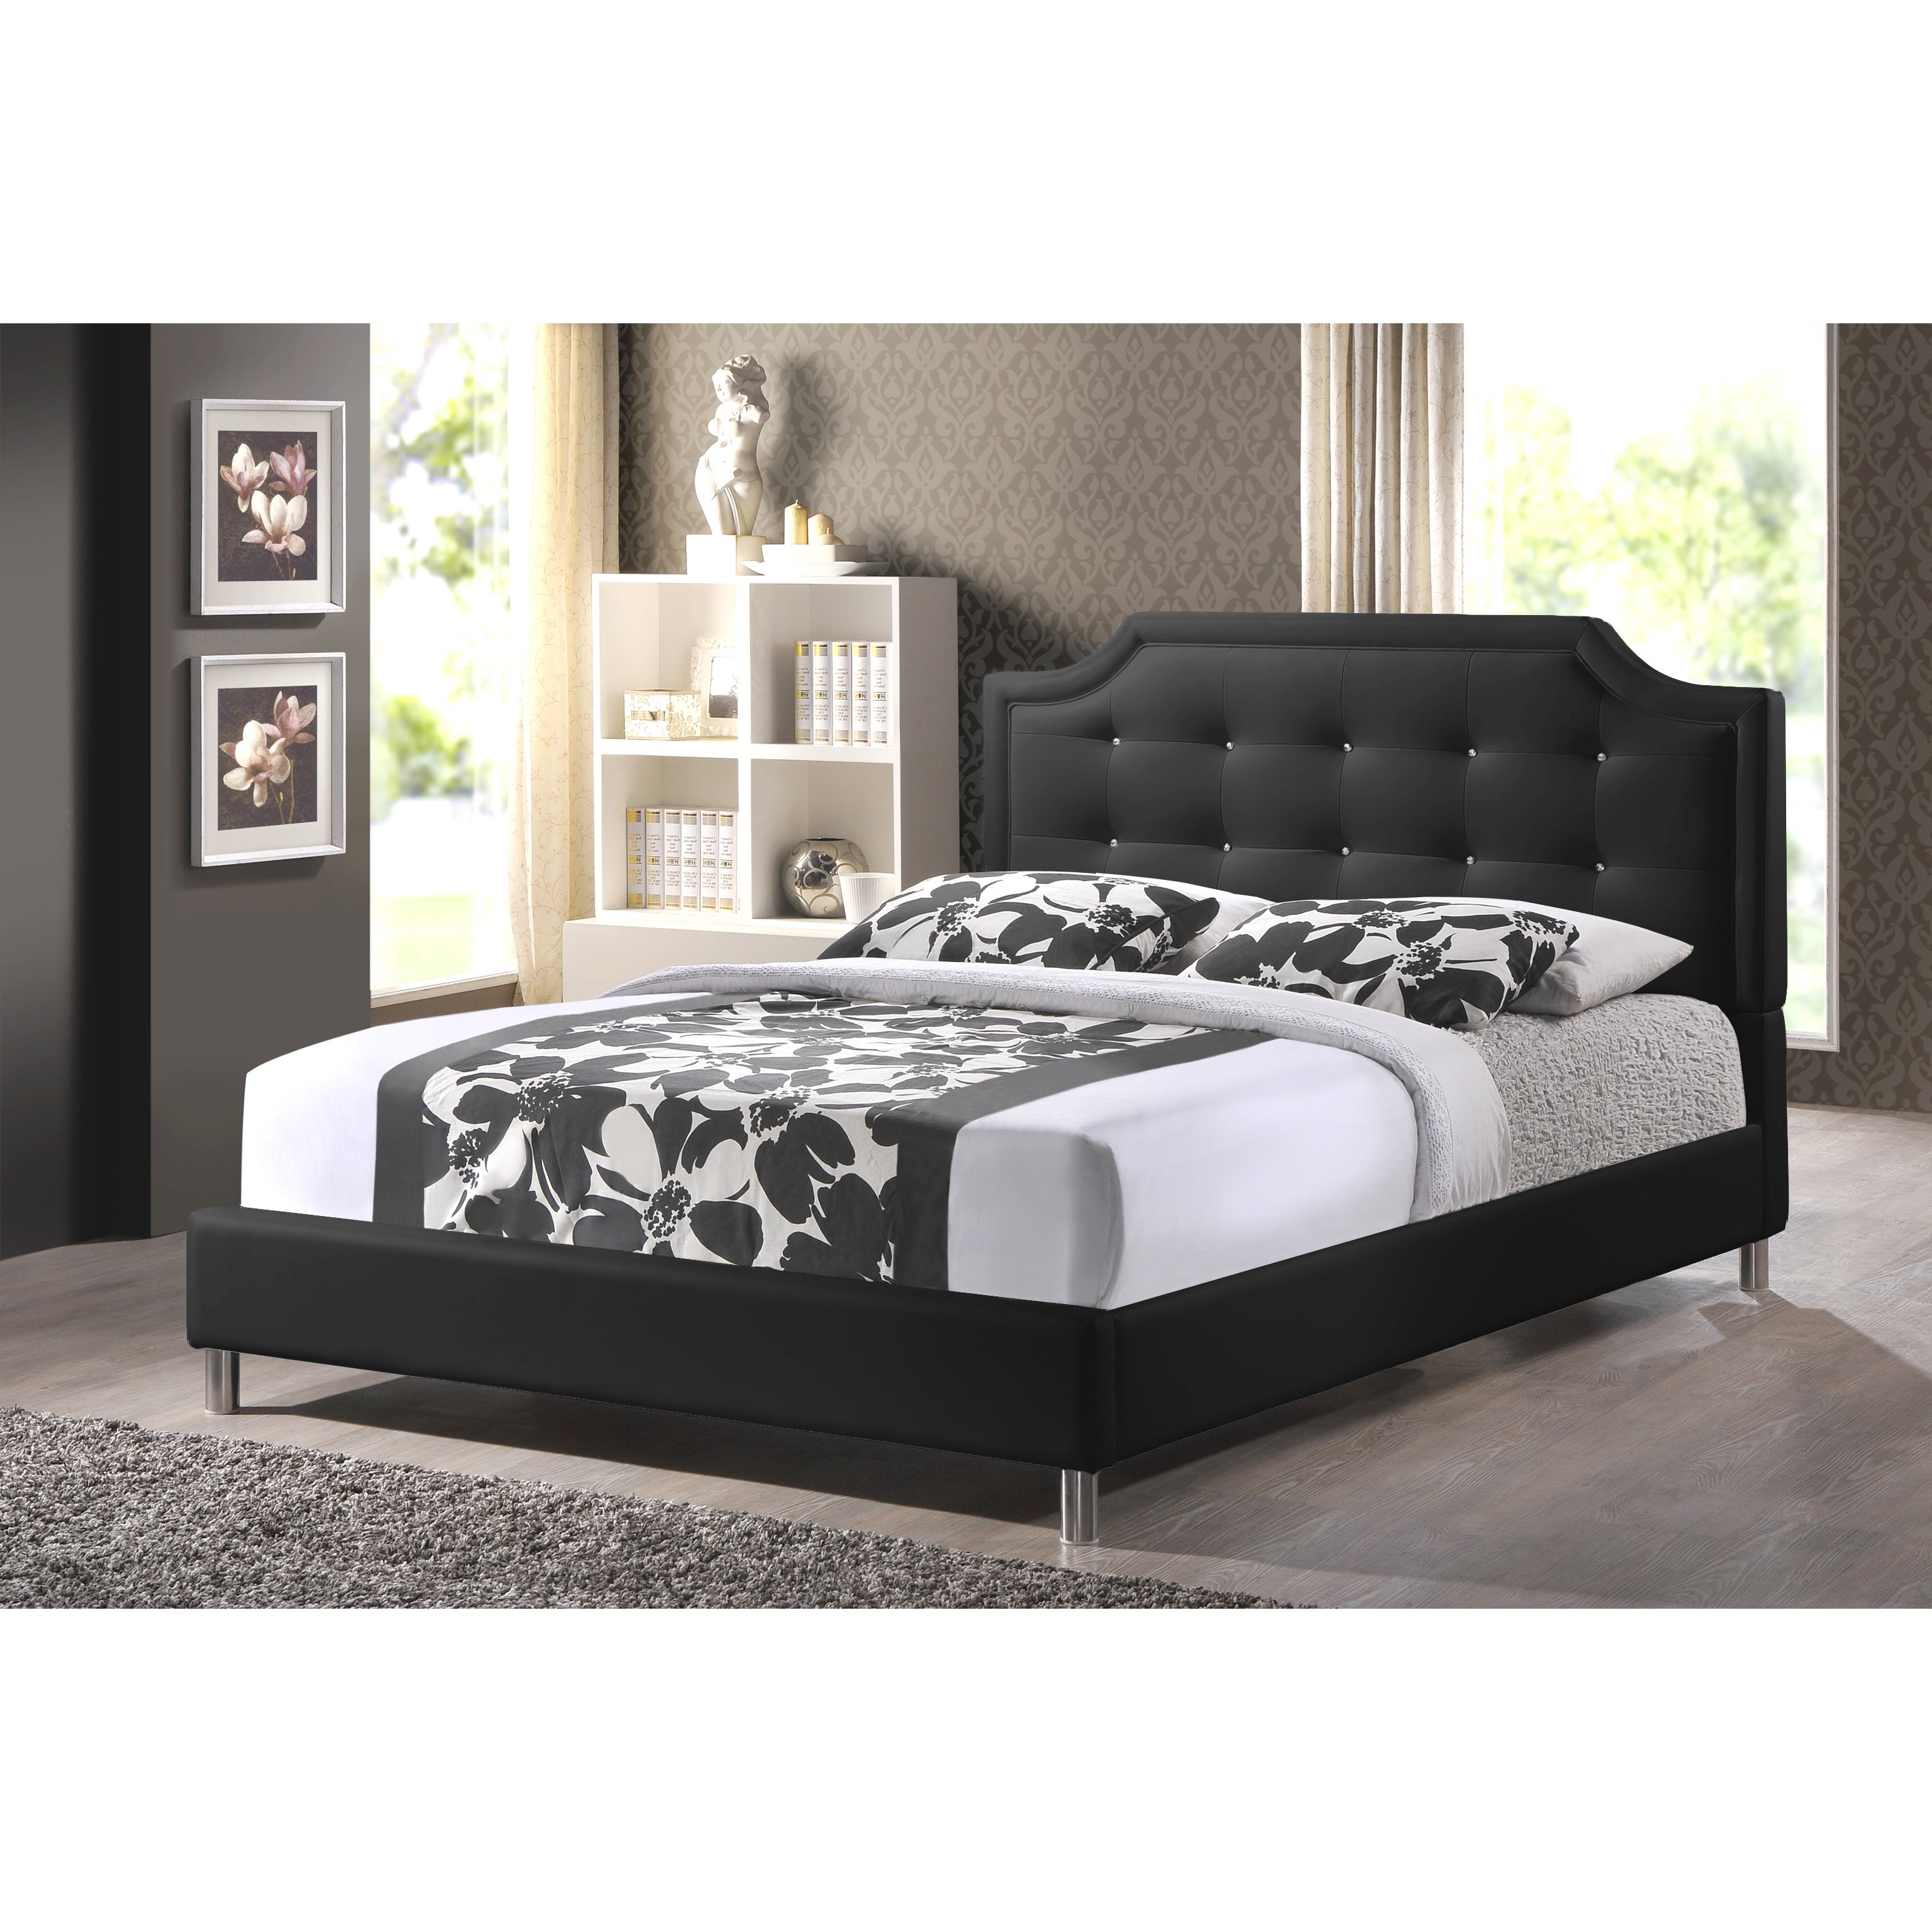 Baxton Studio Carlotta Black Modern Bed with Upholstered Headboard